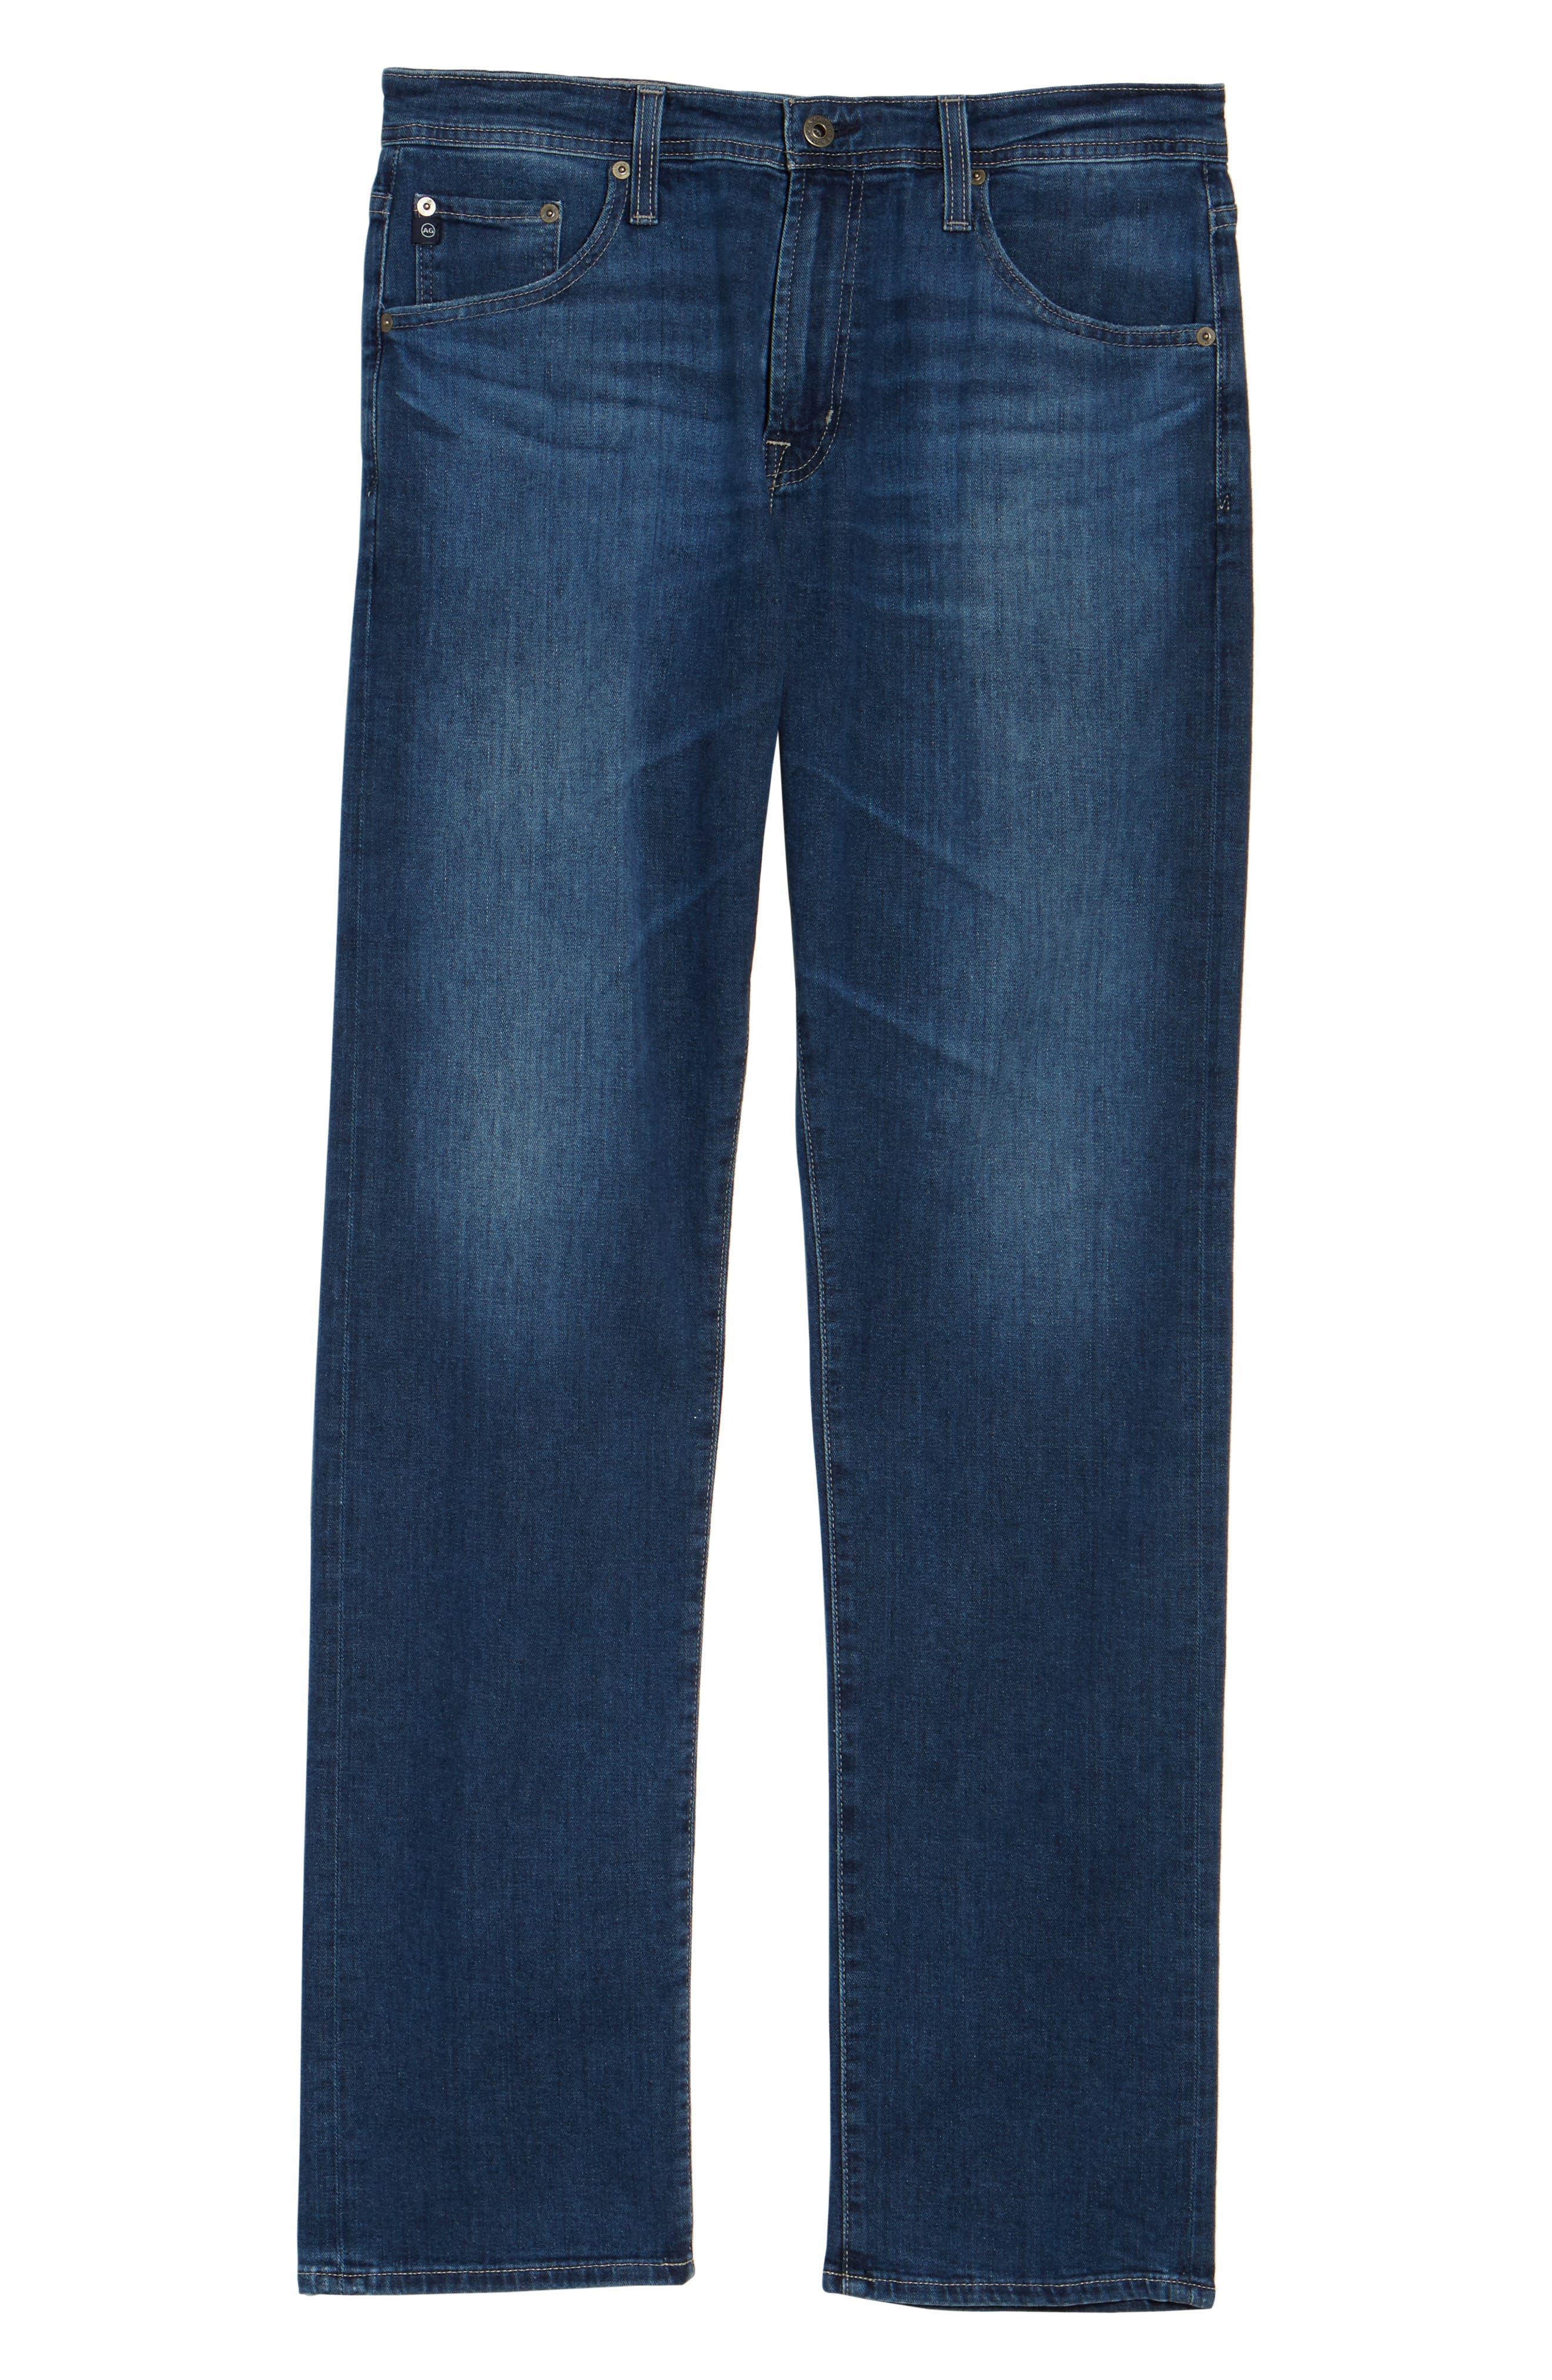 Ives Straight Leg Jeans,                             Alternate thumbnail 6, color,                             Stately